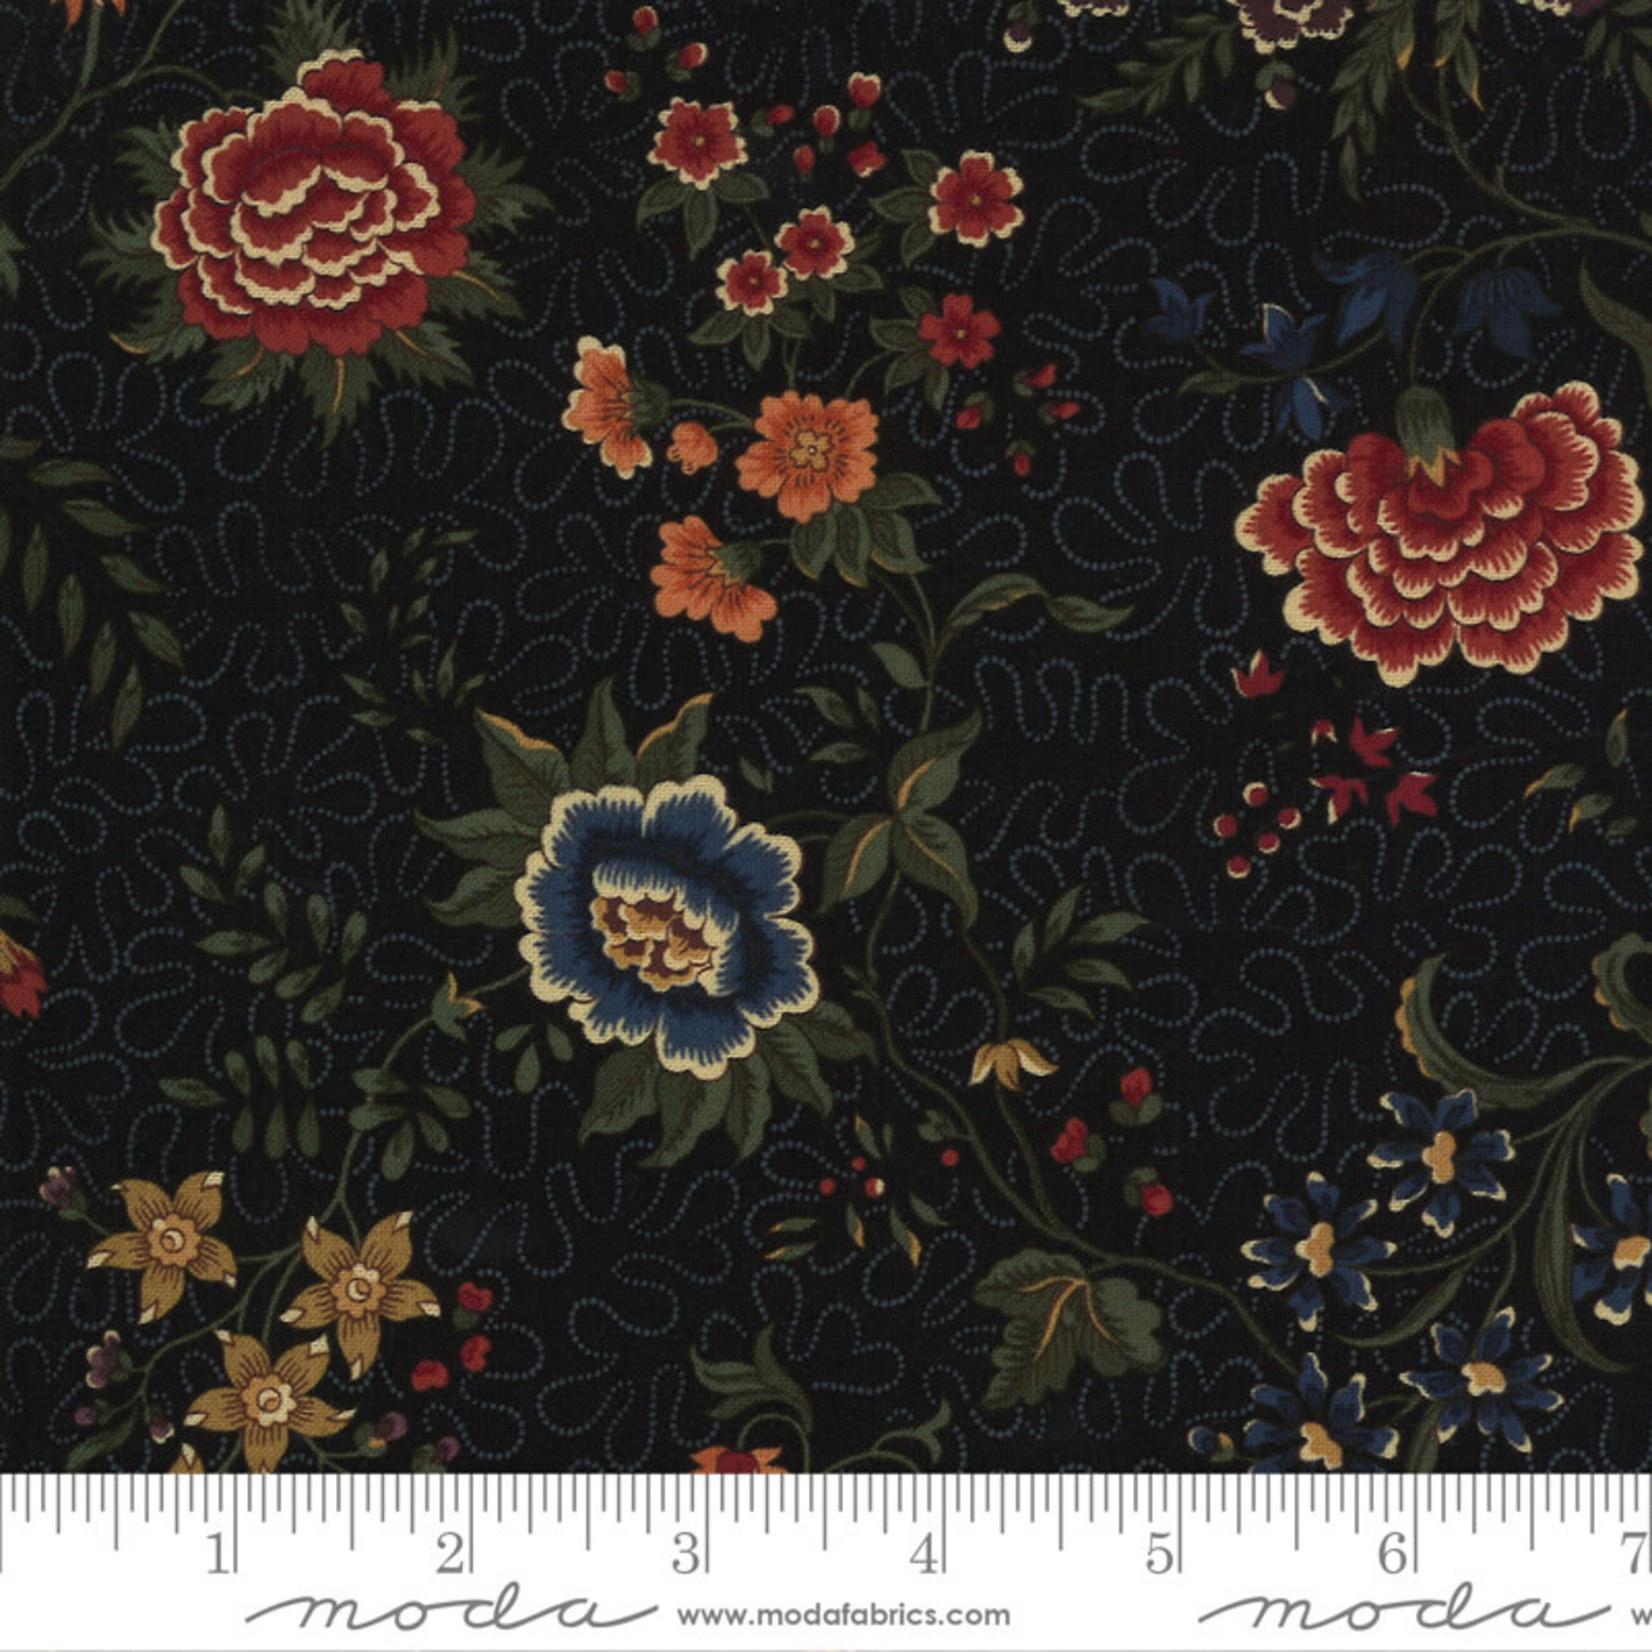 Kansas Troubles Quilters Prairie Dreams, Prairie Flowers Florals, Black 9650 19 $0.20 per cm or $20/m